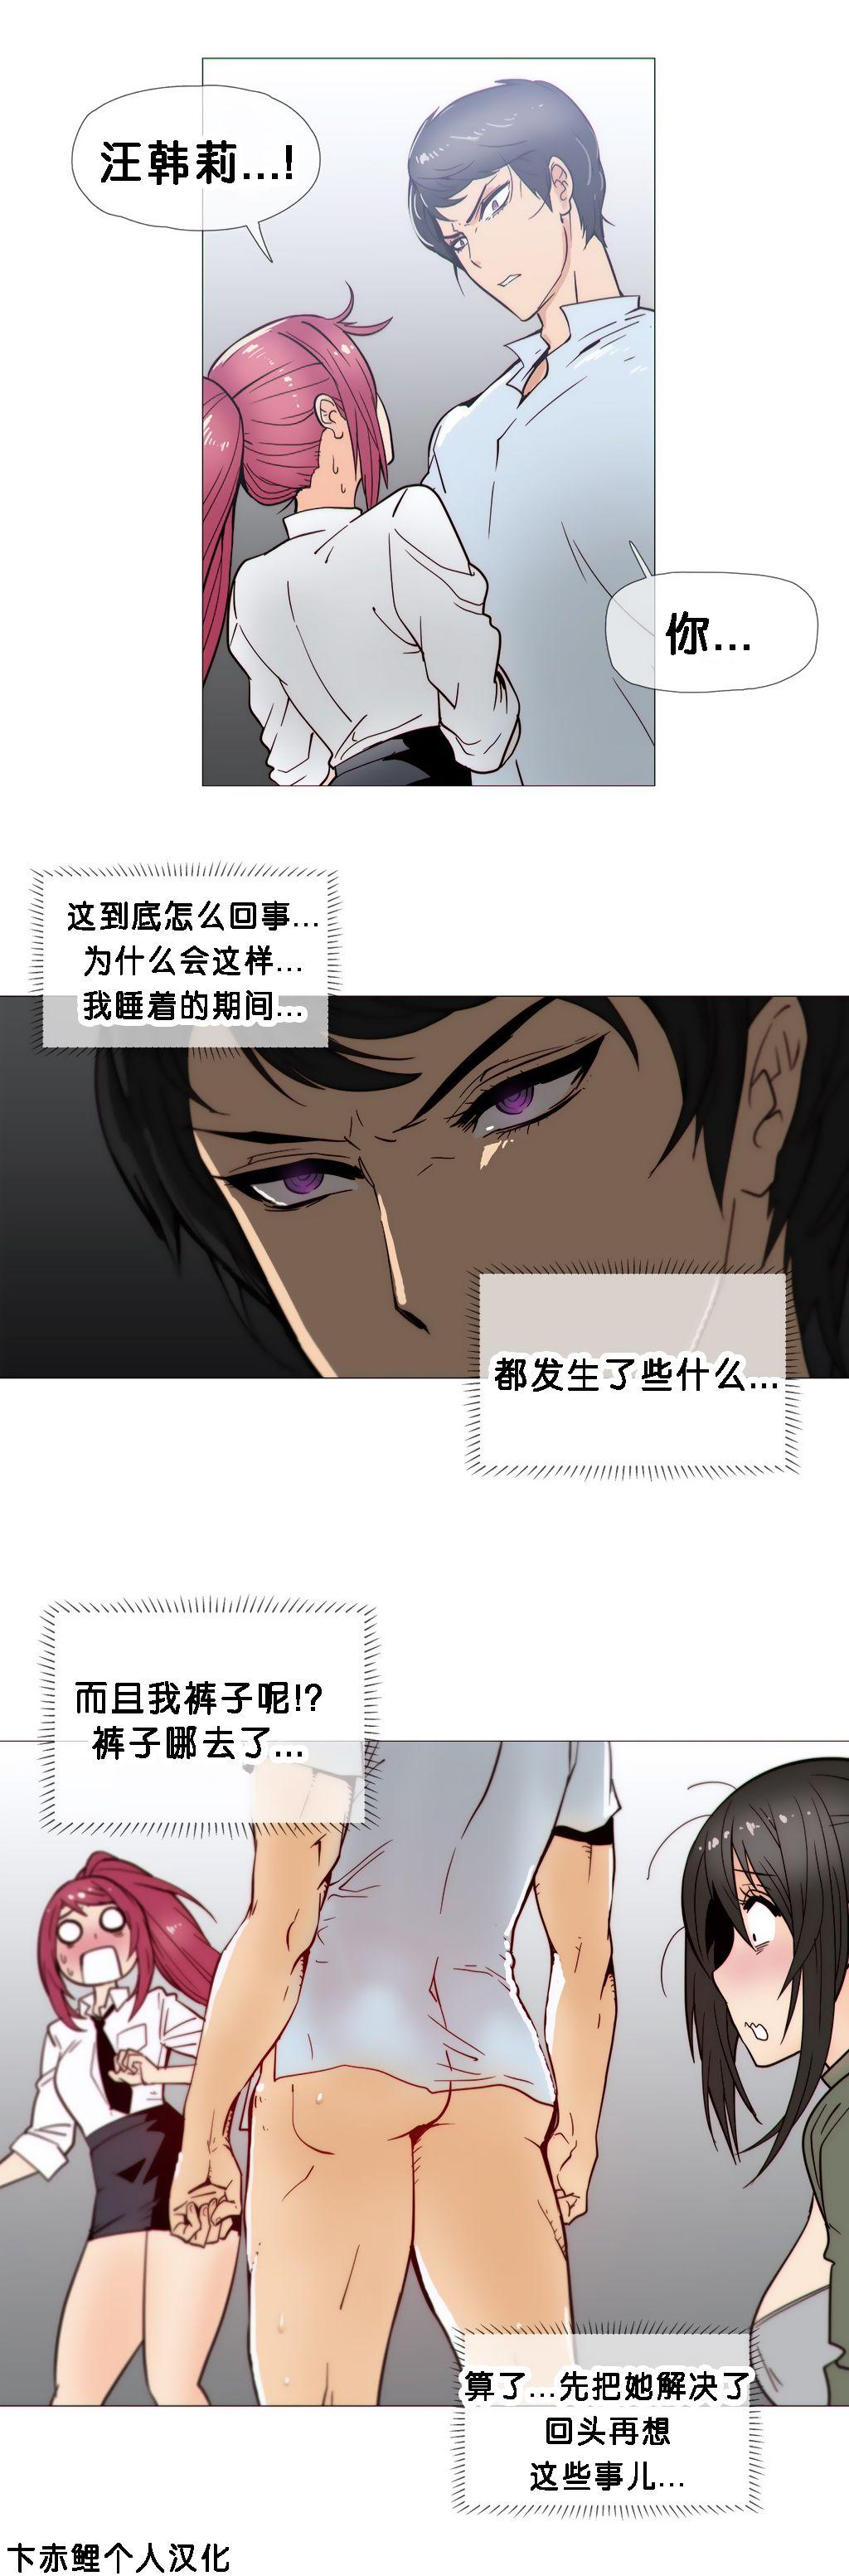 HouseHold Affairs 【卞赤鲤个人汉化】1~33话(持续更新中) 502